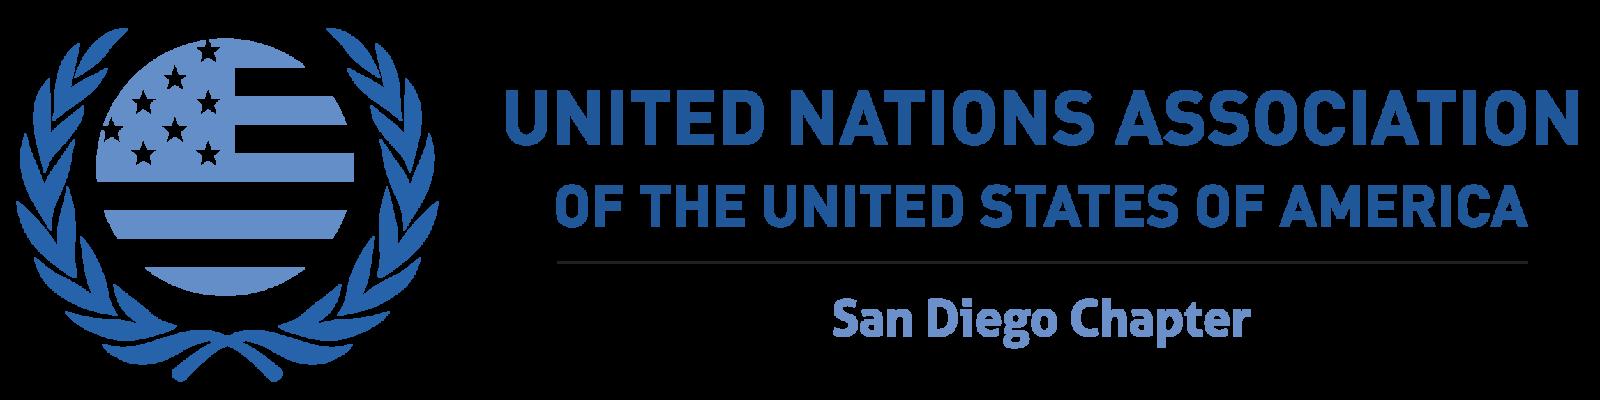 UNA-USA San Diego